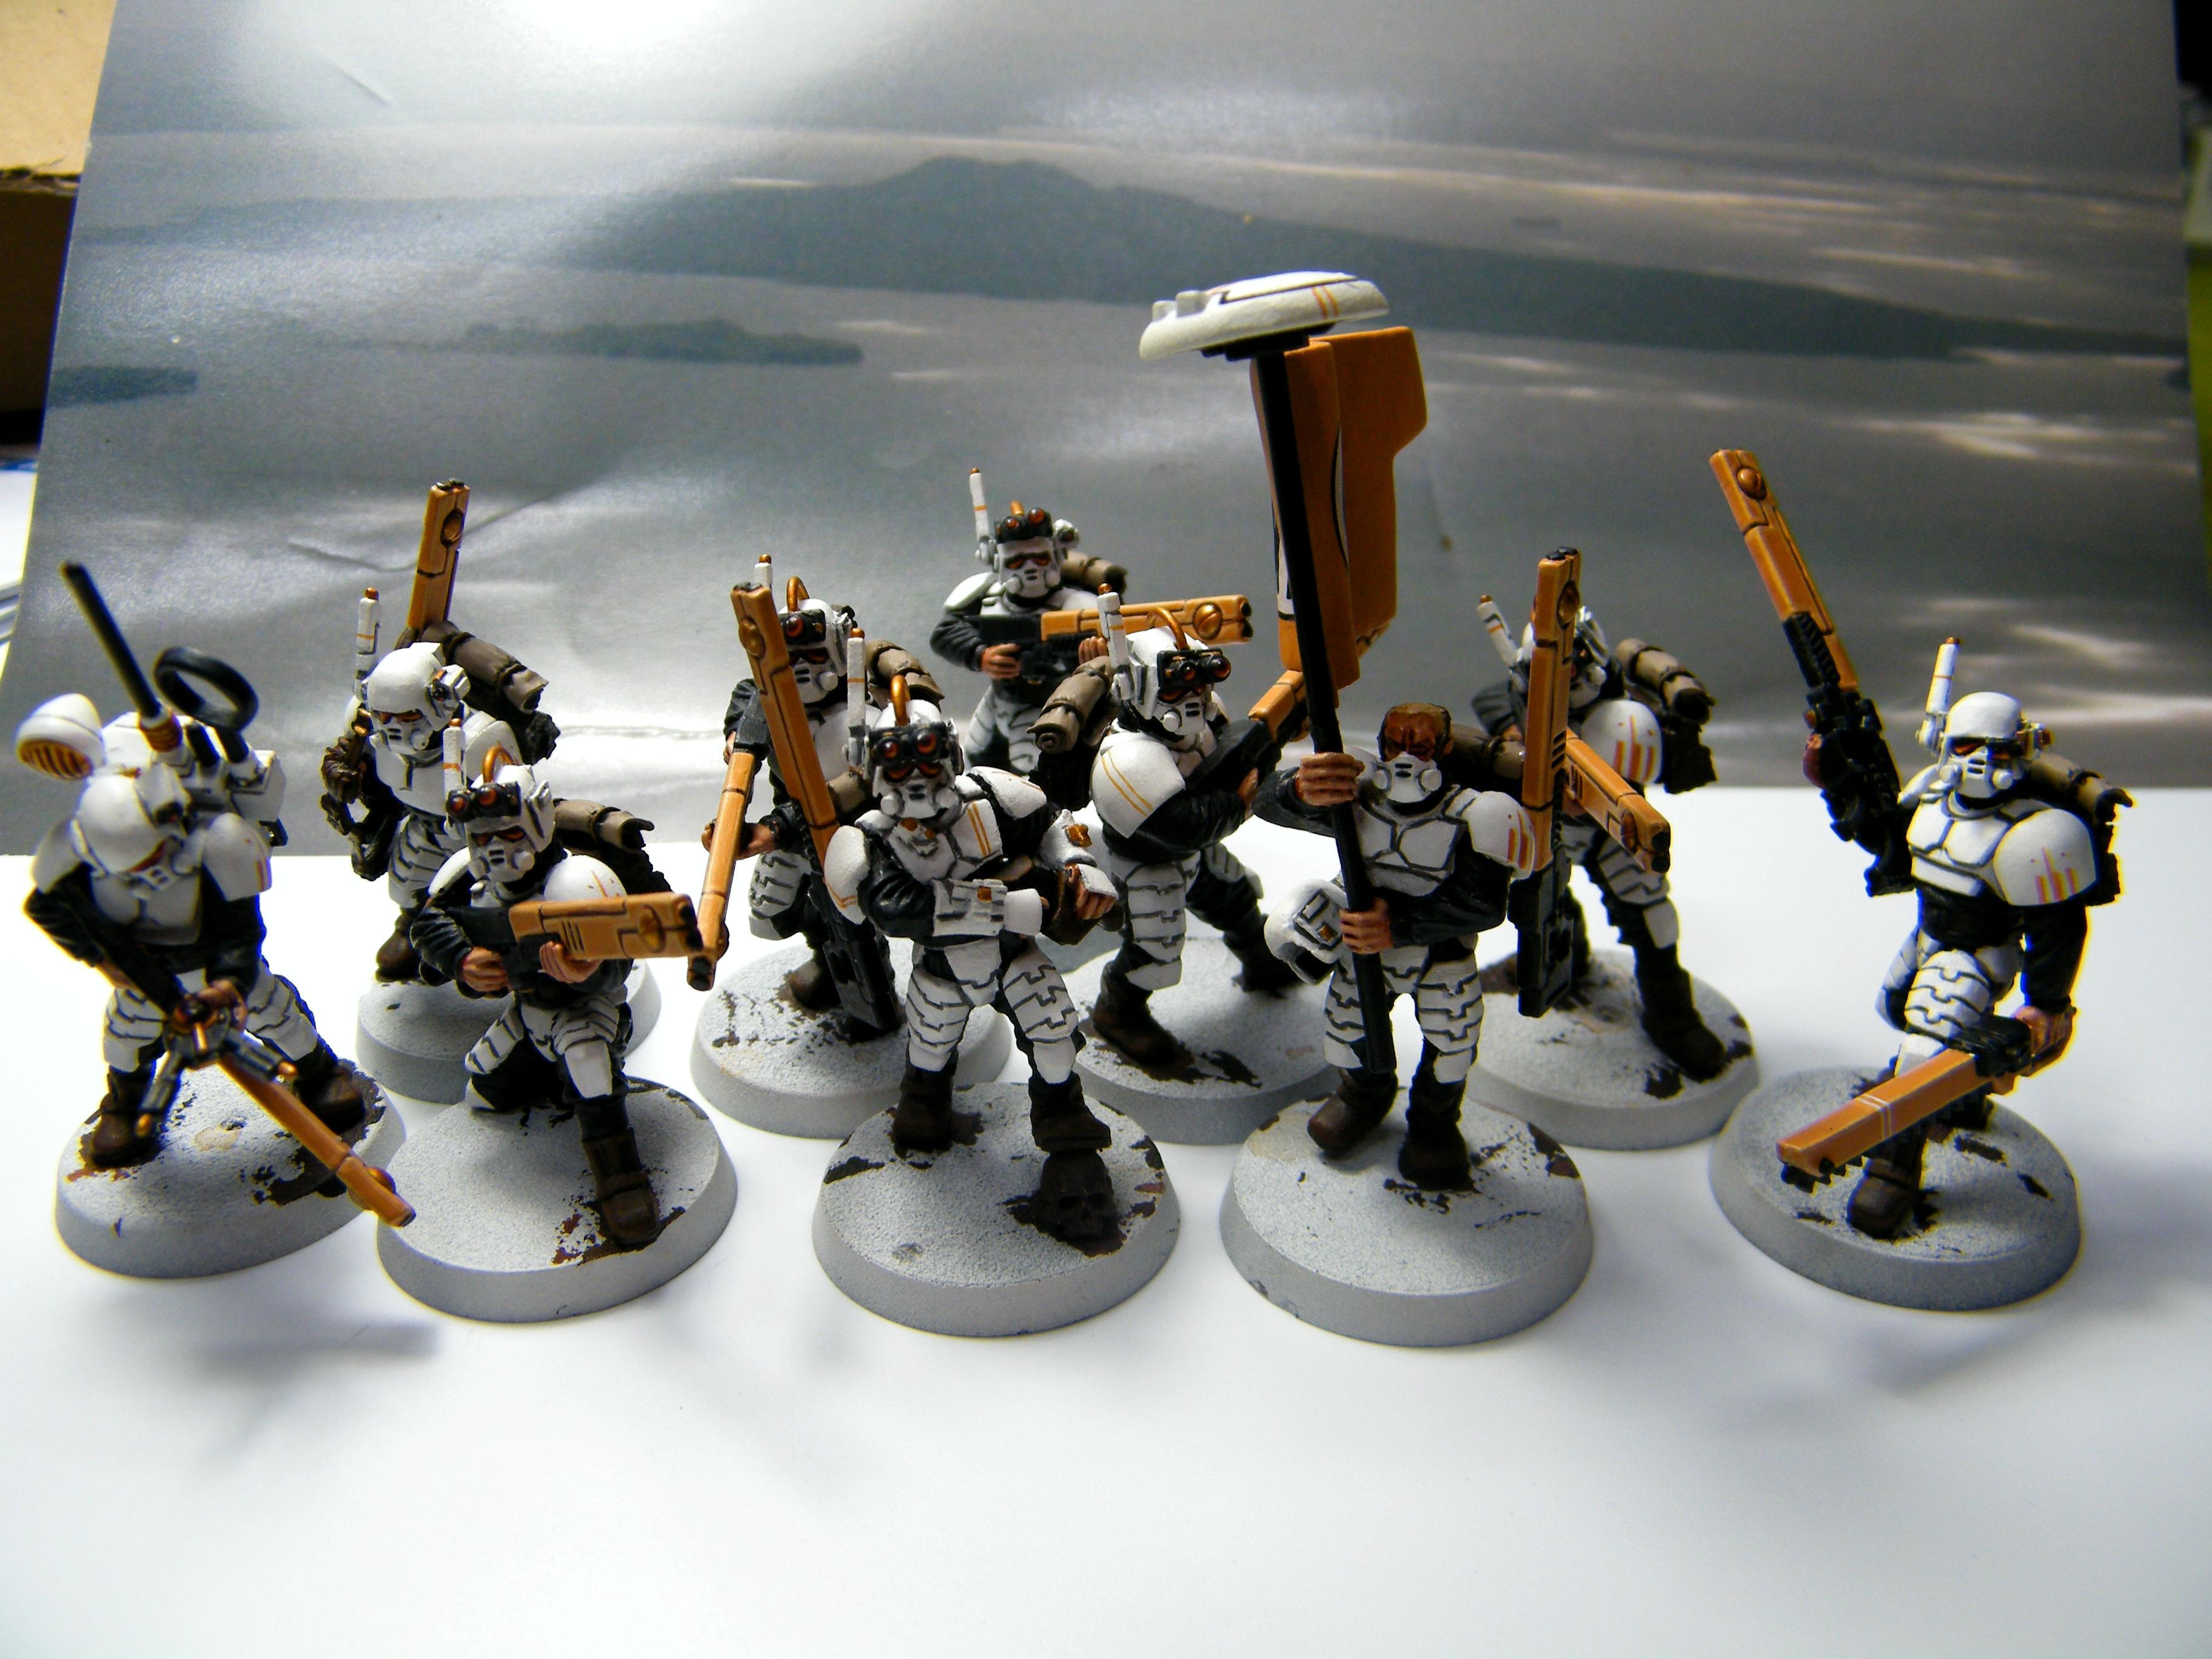 Army, Conversion, Empire, Guevesa, Imeprial Guard, Kitbash, Tau, Warhammer 40,000